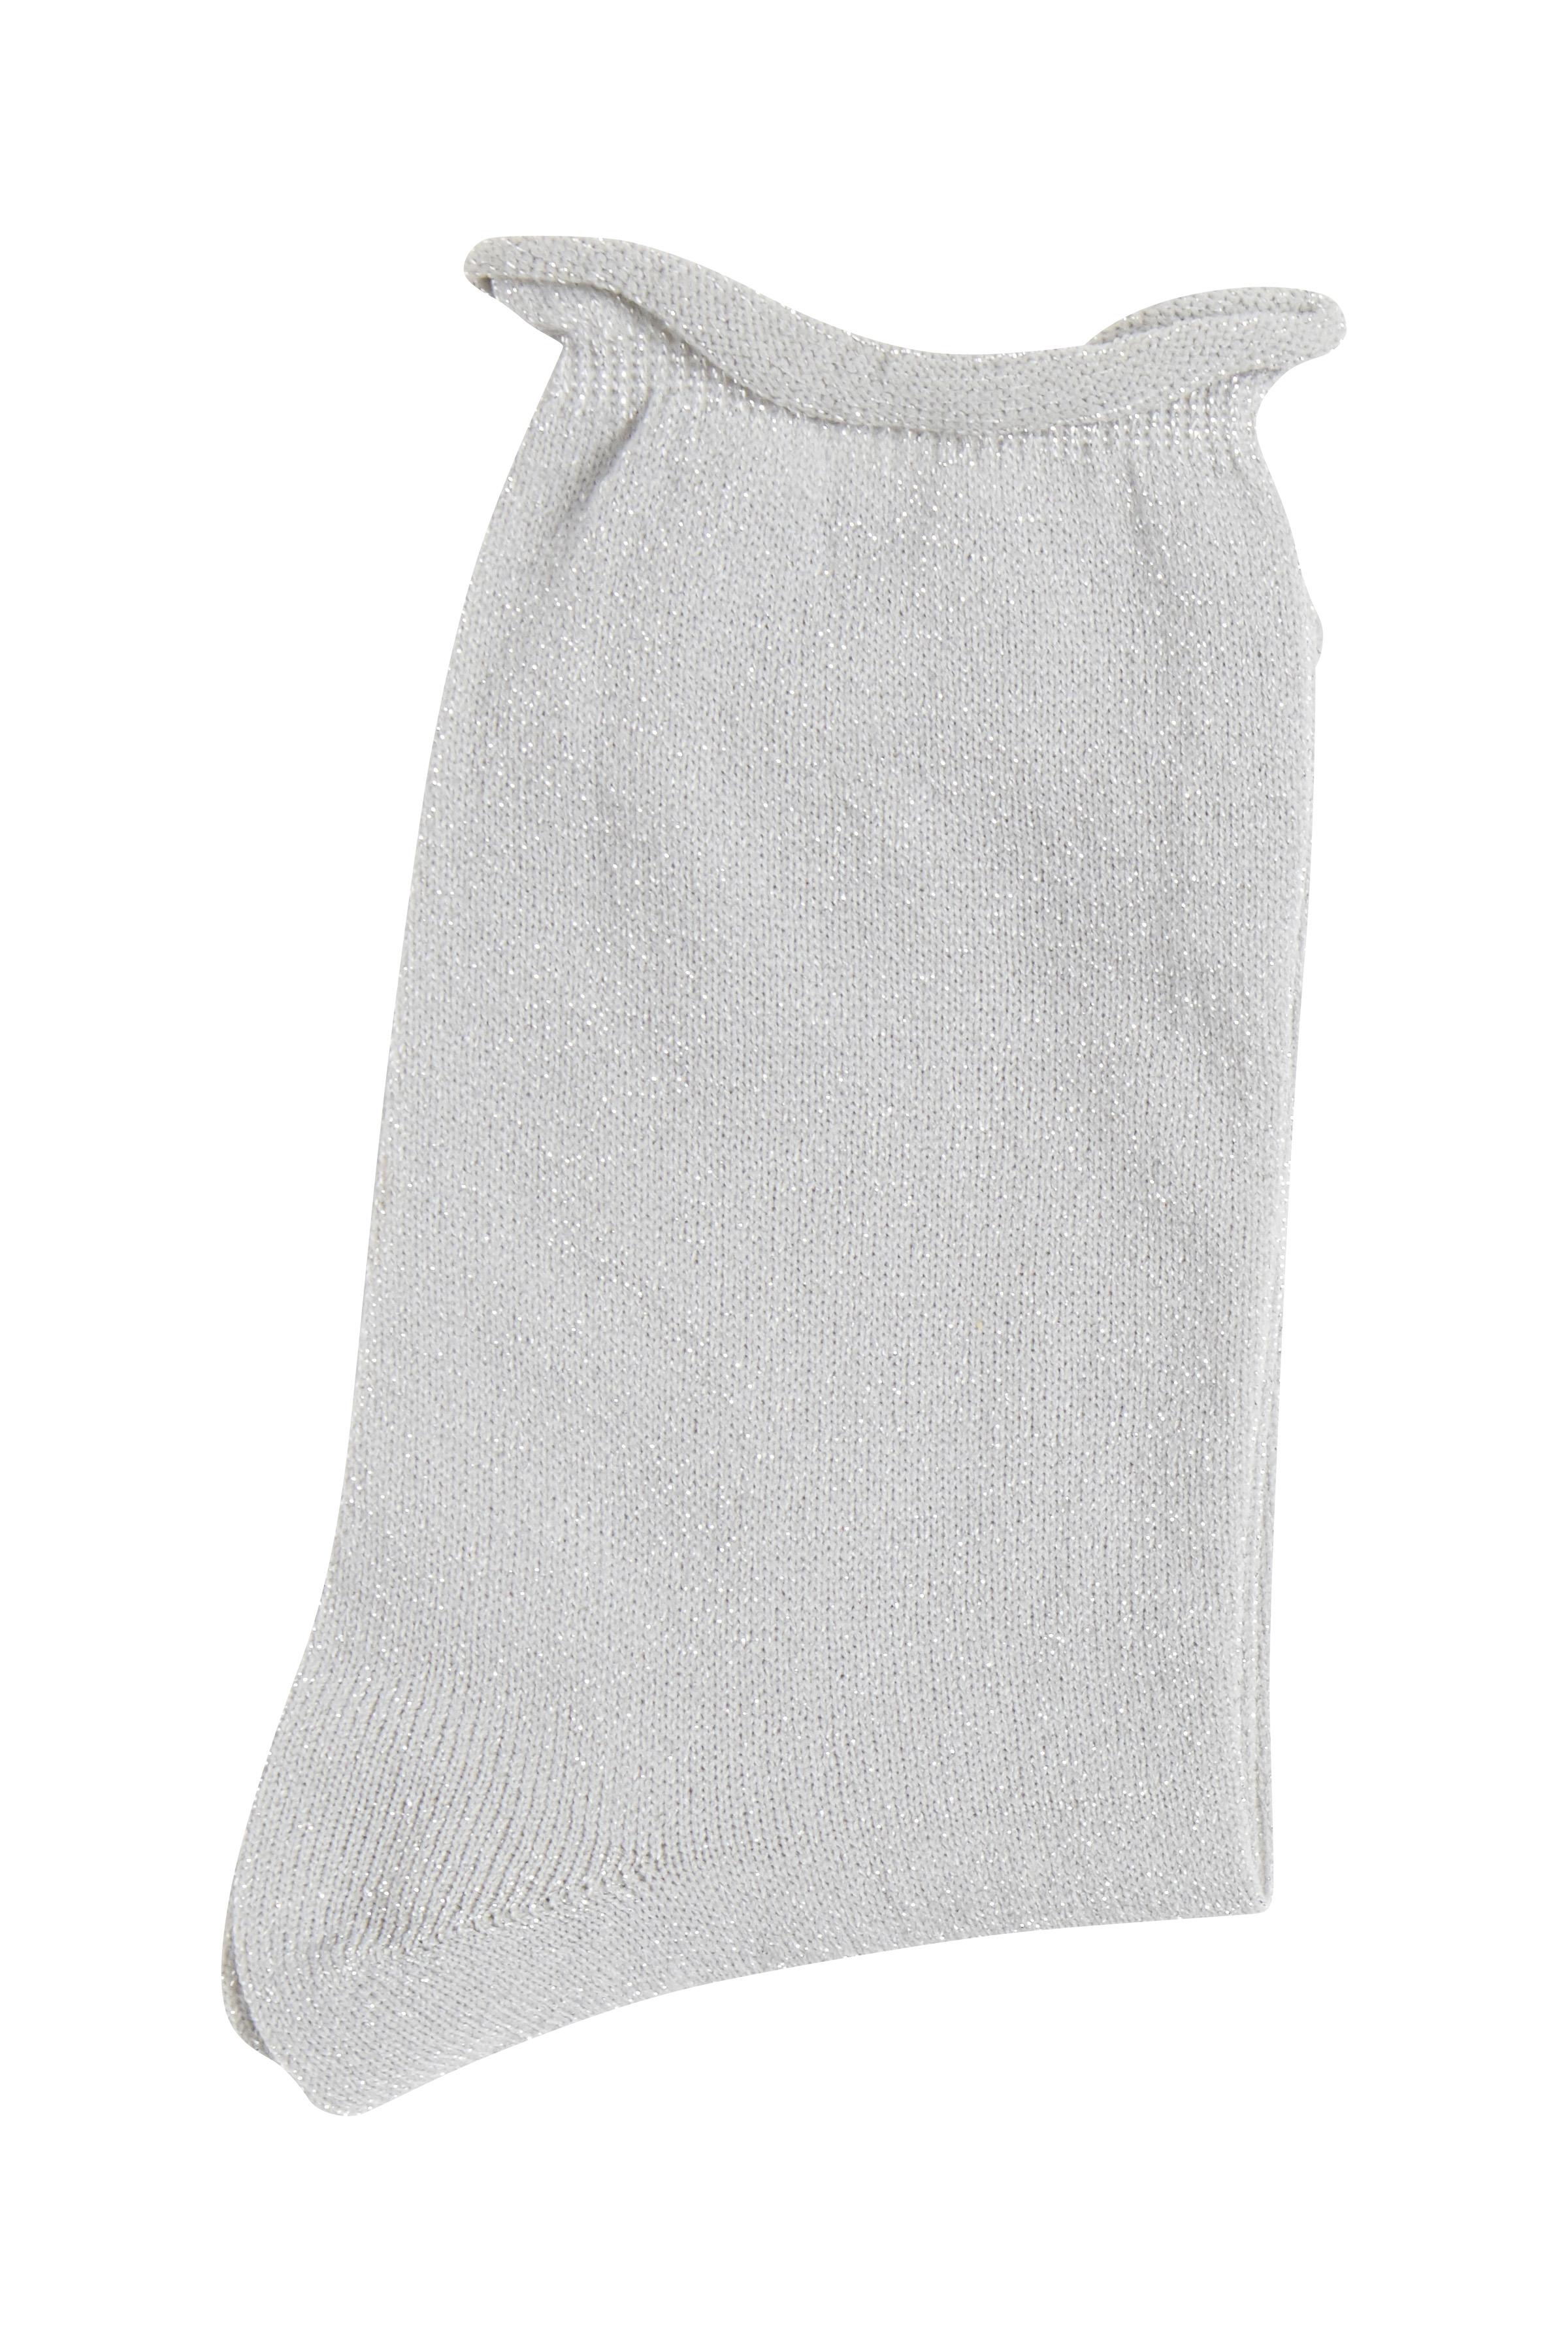 Lys gråmeleret Strømper fra Ichi - accessories – Køb Lys gråmeleret Strømper fra str. ONE her